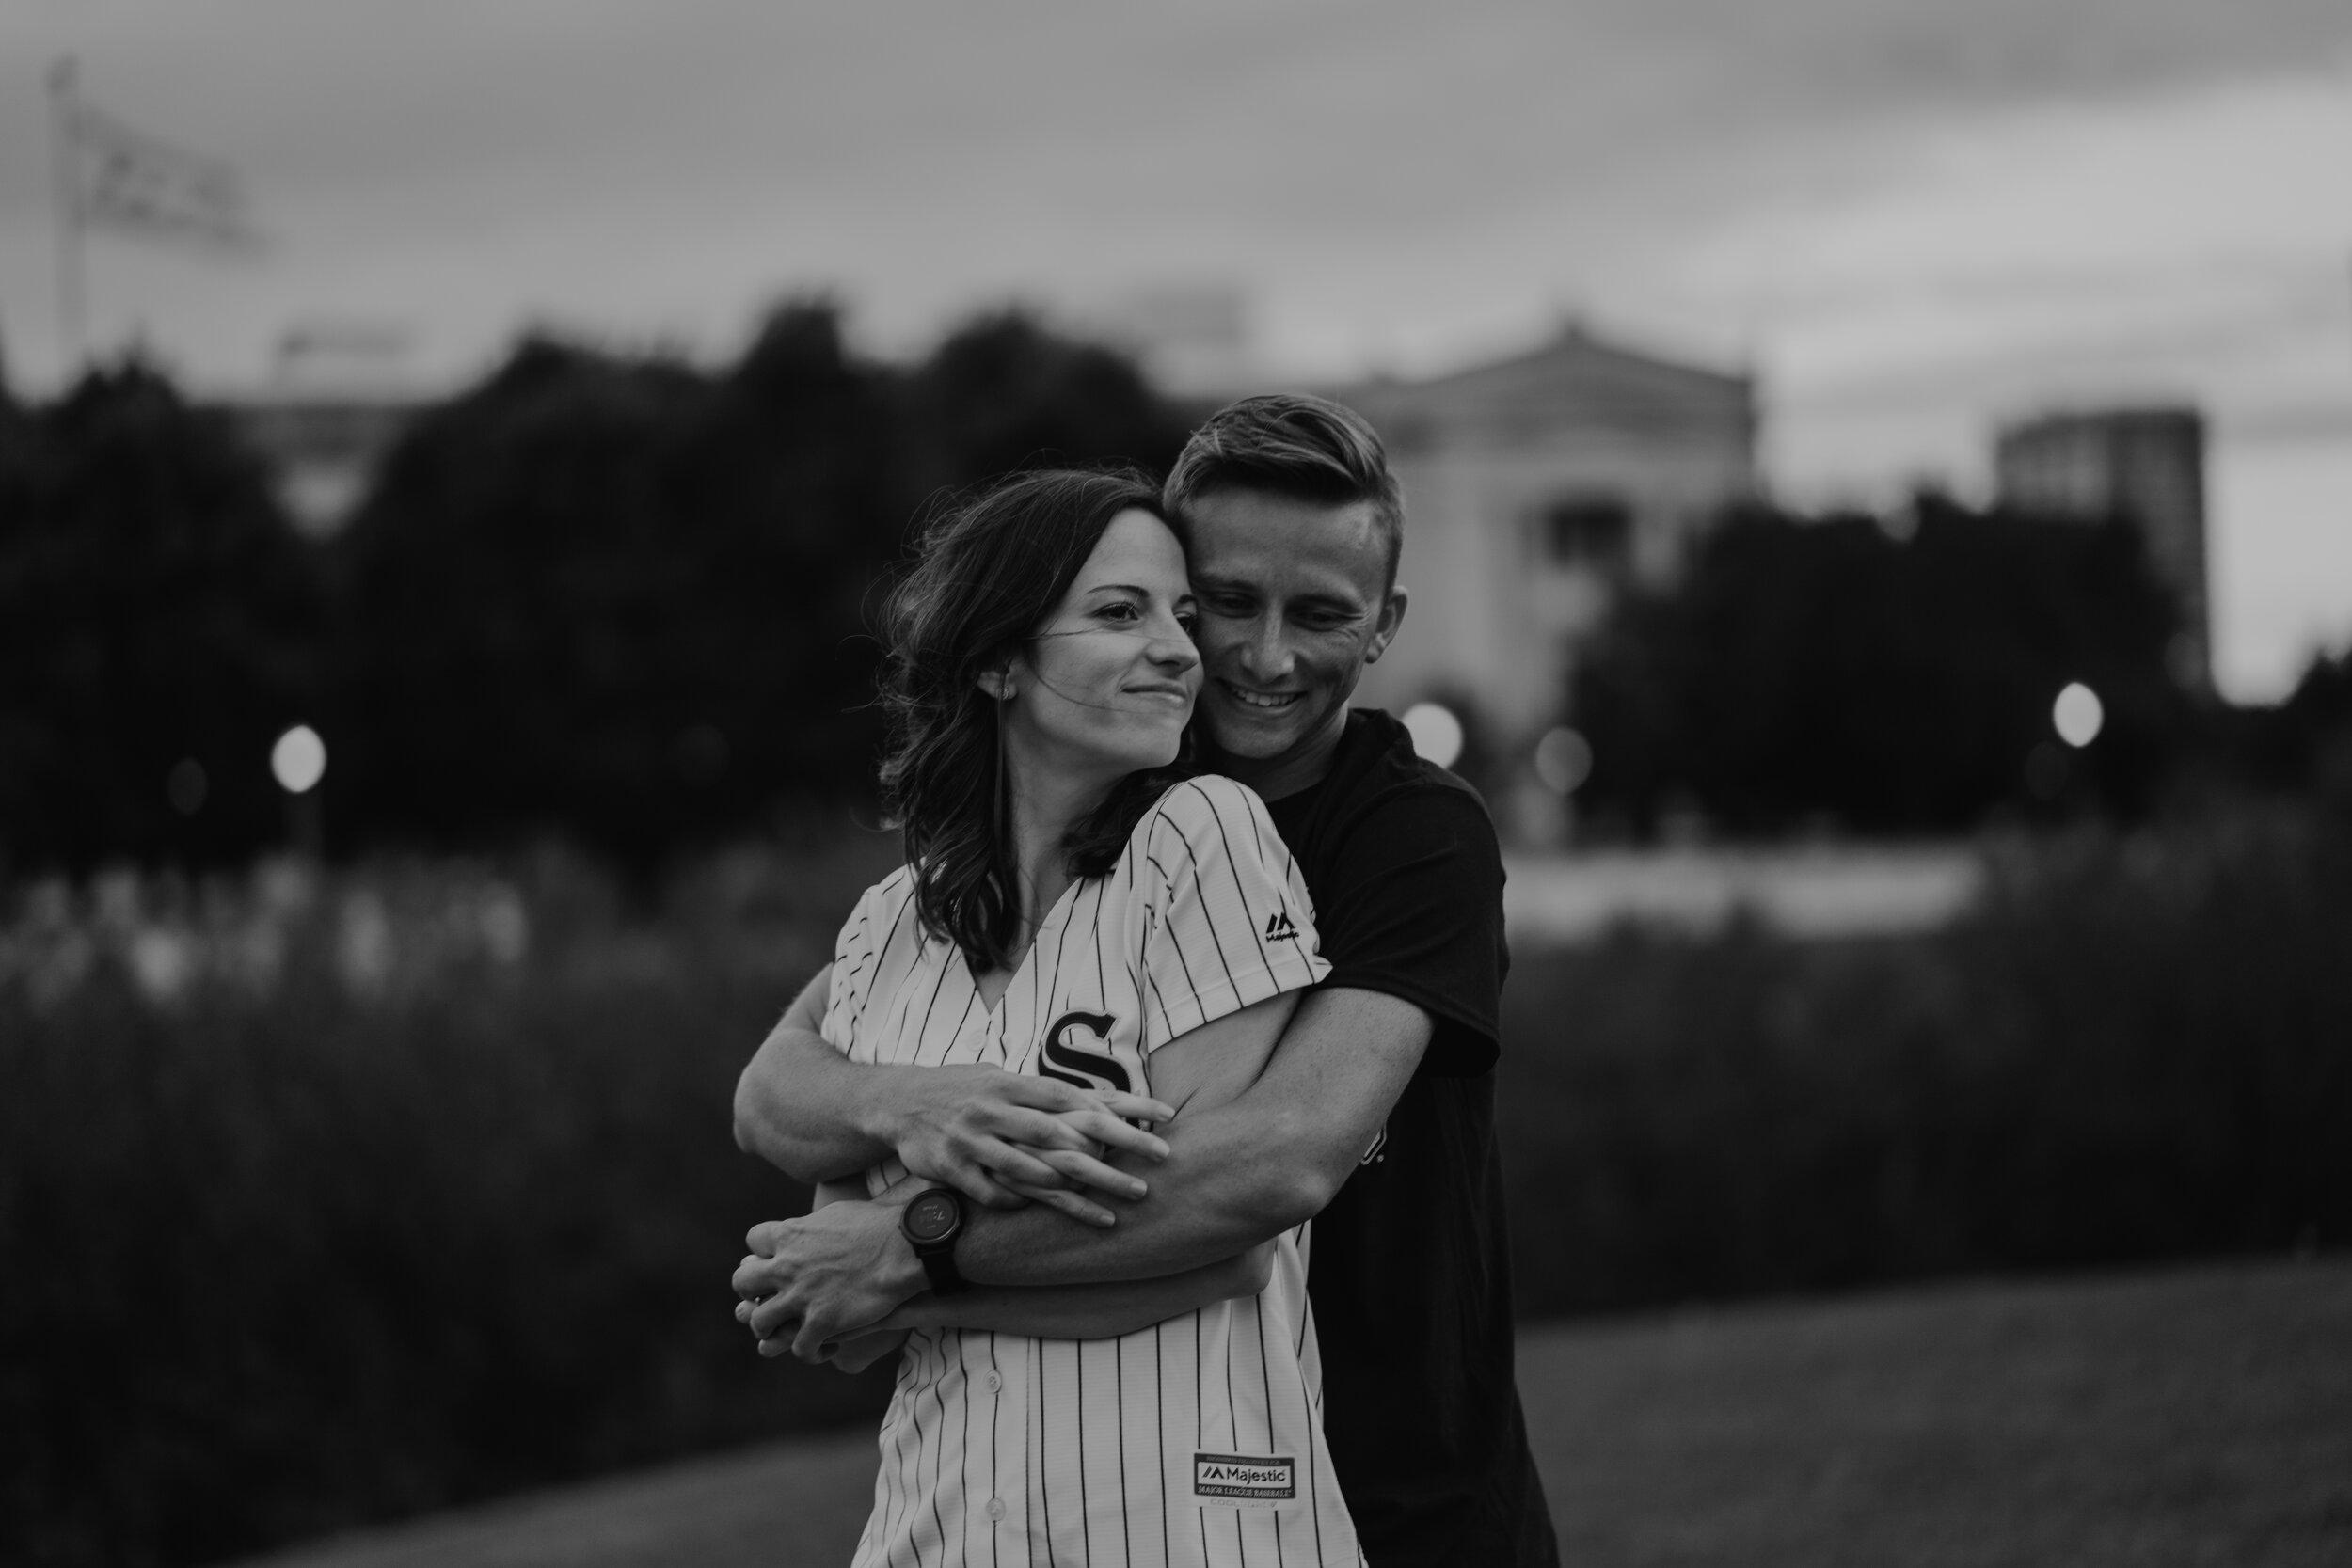 Erin & Jeff Engagement Photos - Datflipmel Photo & Films-00614.jpg